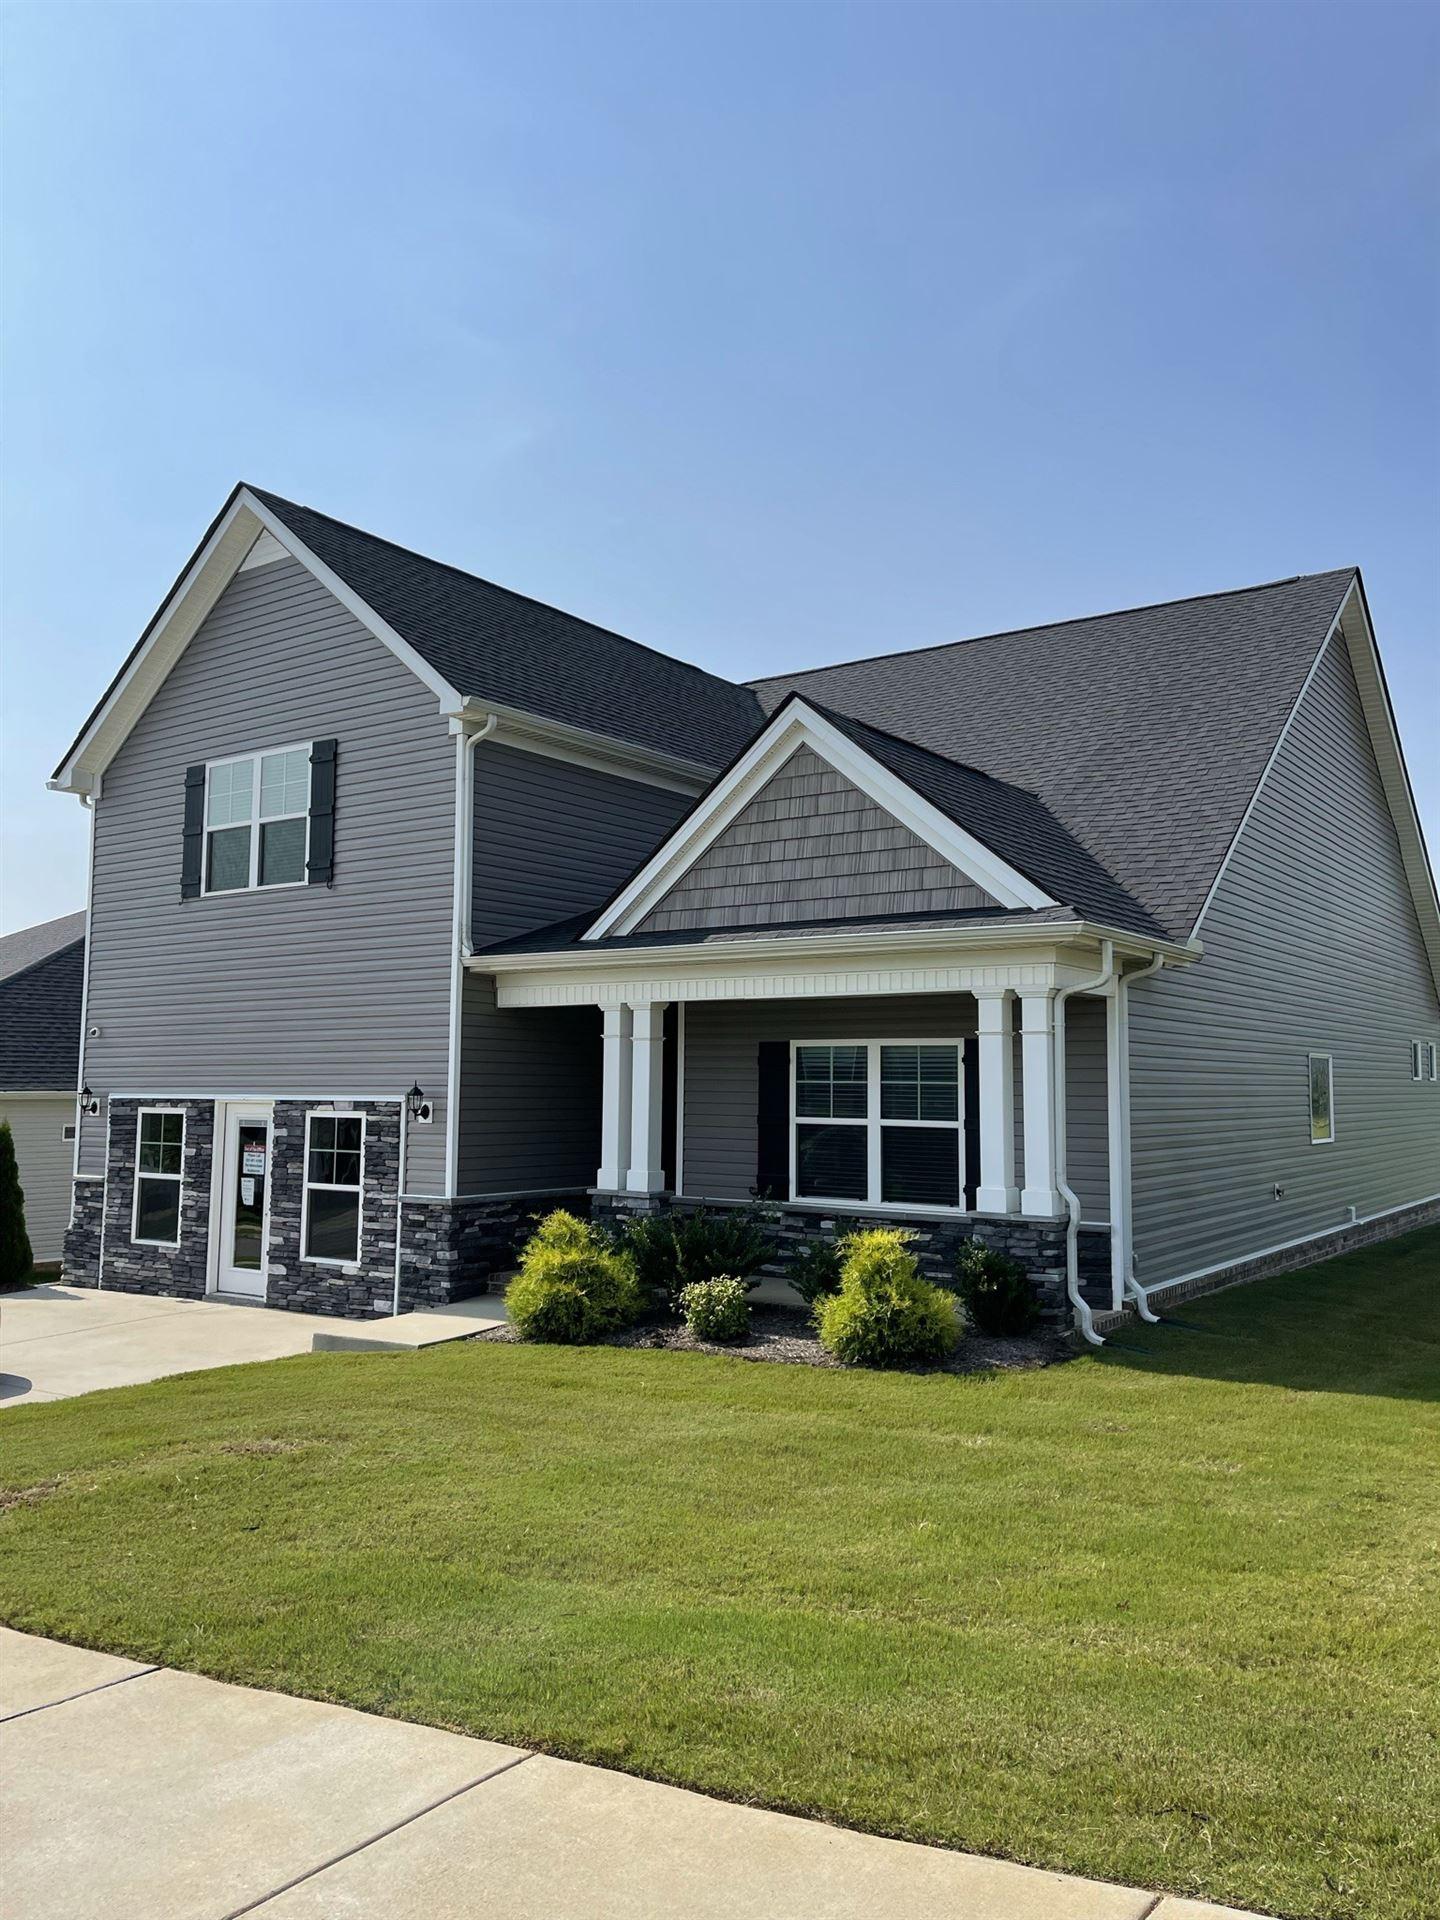 100 East Coker Way Lot 1, Spring Hill, TN 37174 - MLS#: 2277270